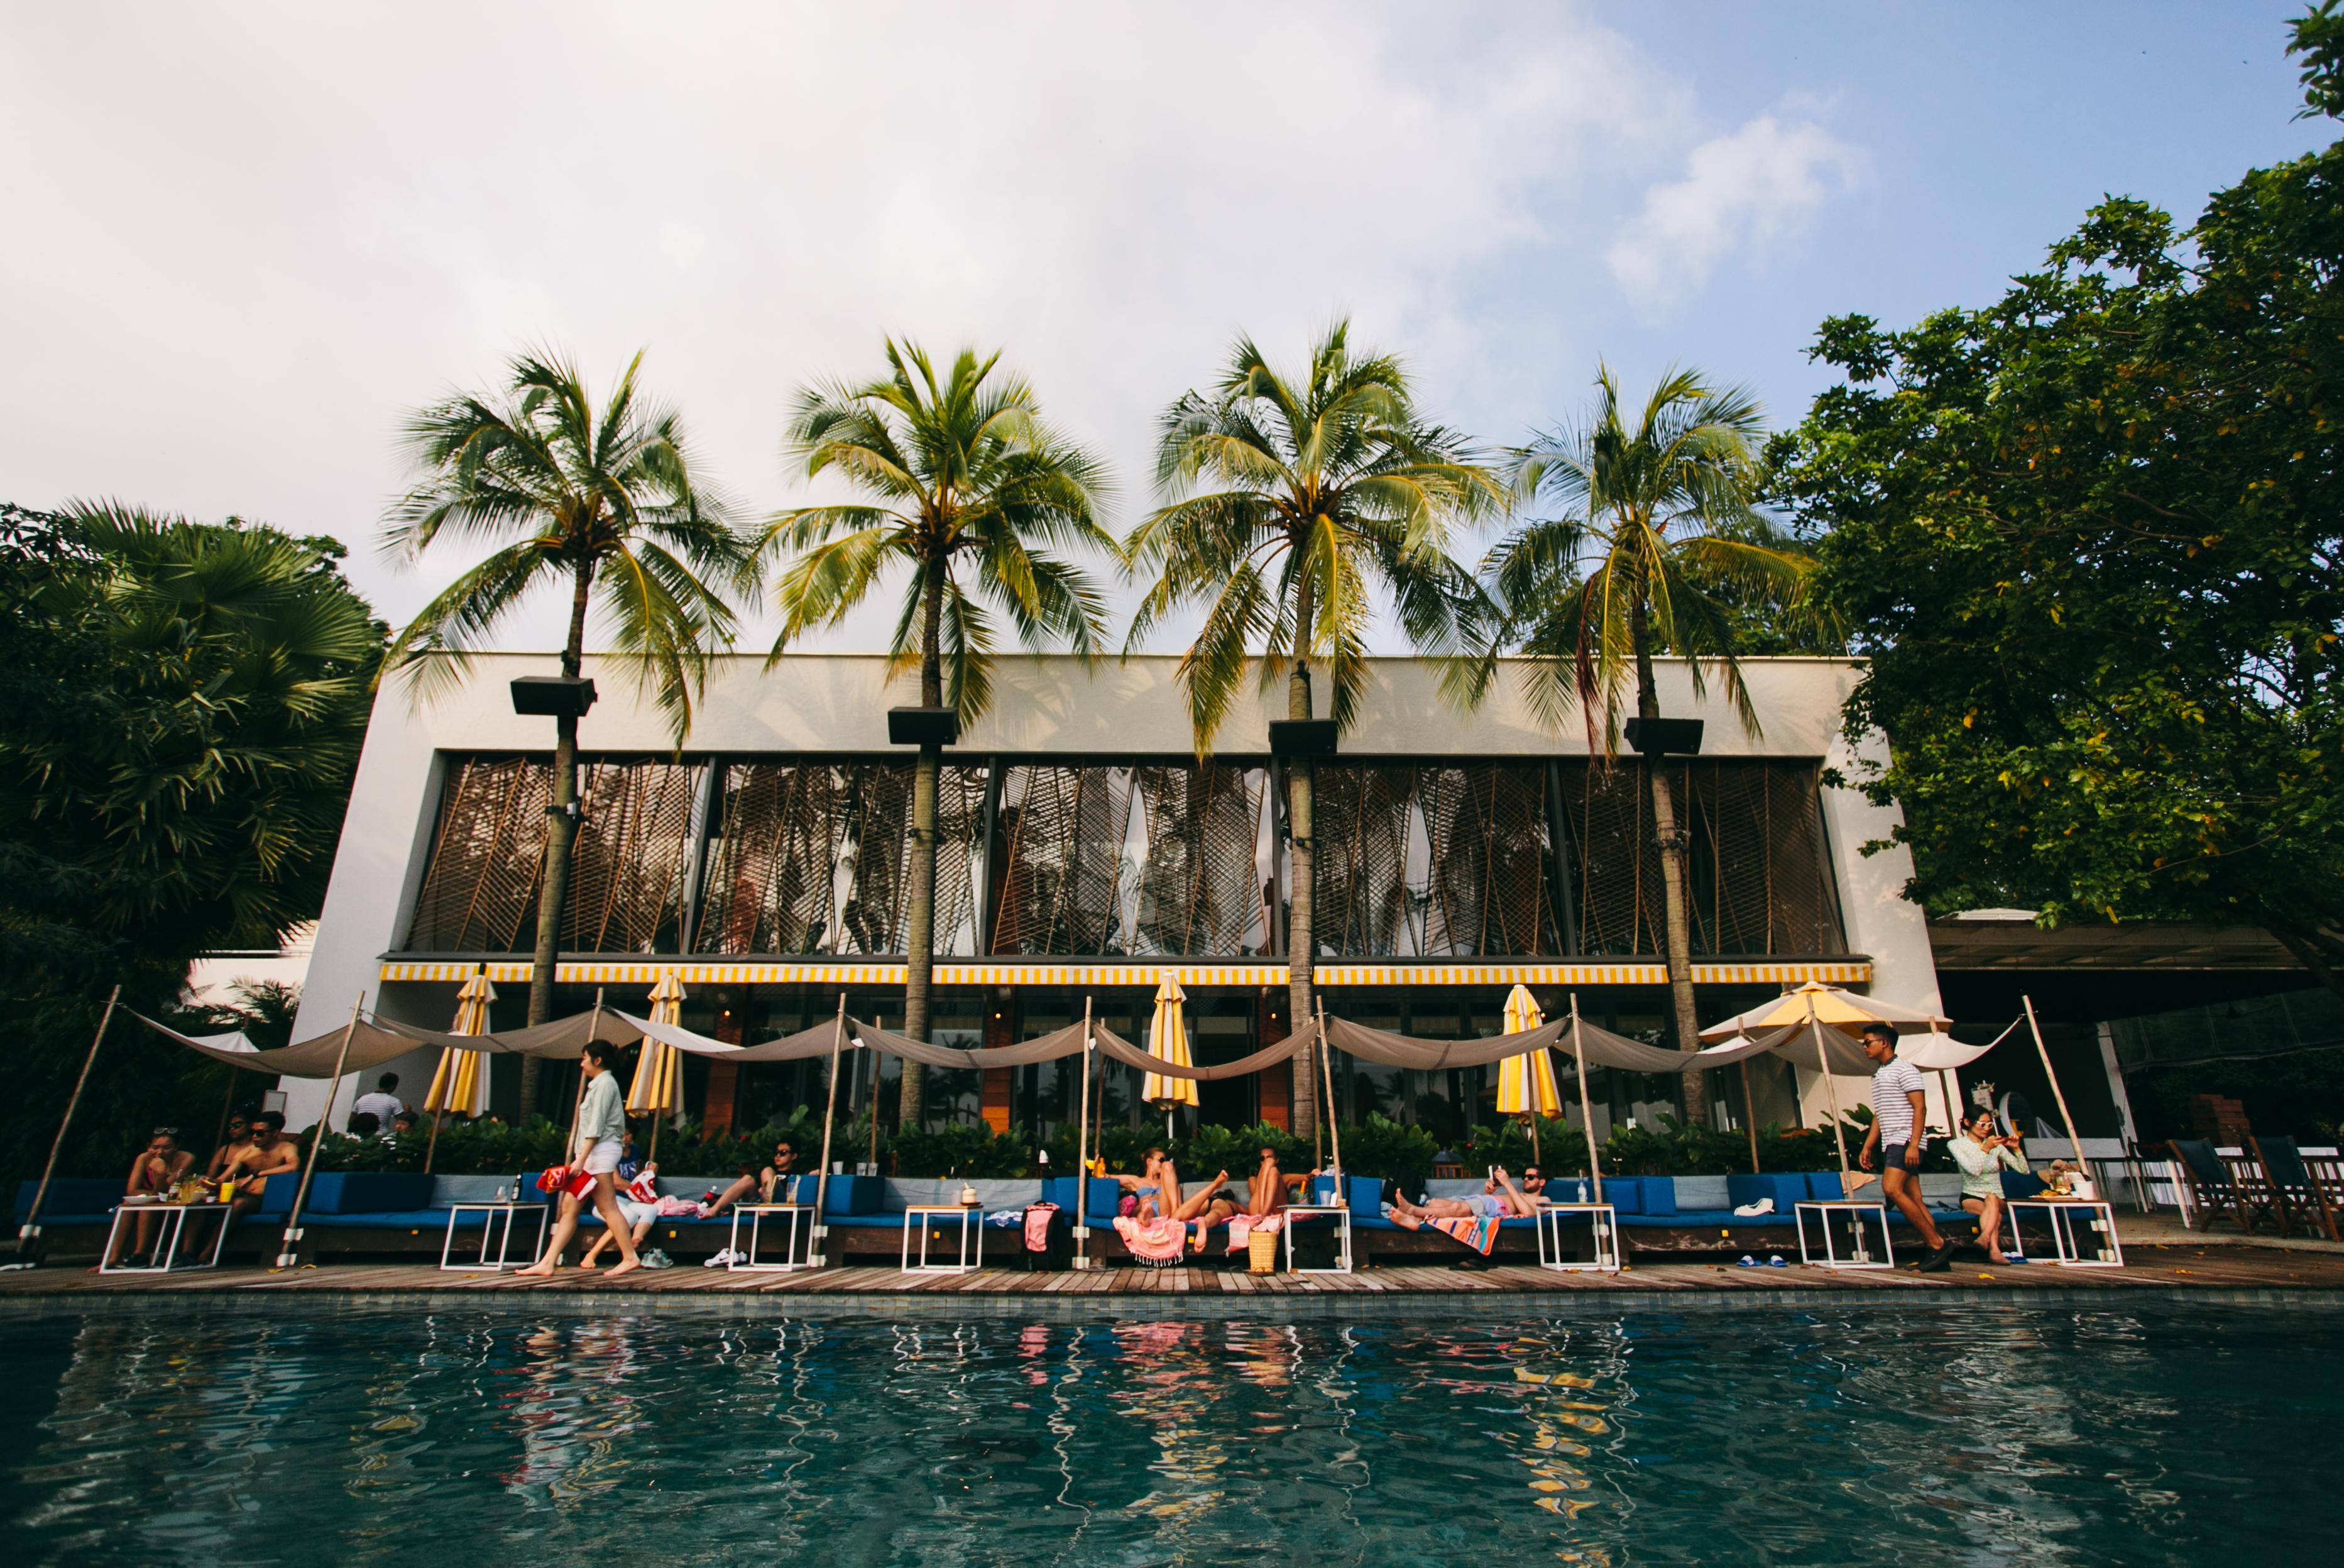 year-end-party-venue-venuerific-blog-tanjong-beach-club-poolside